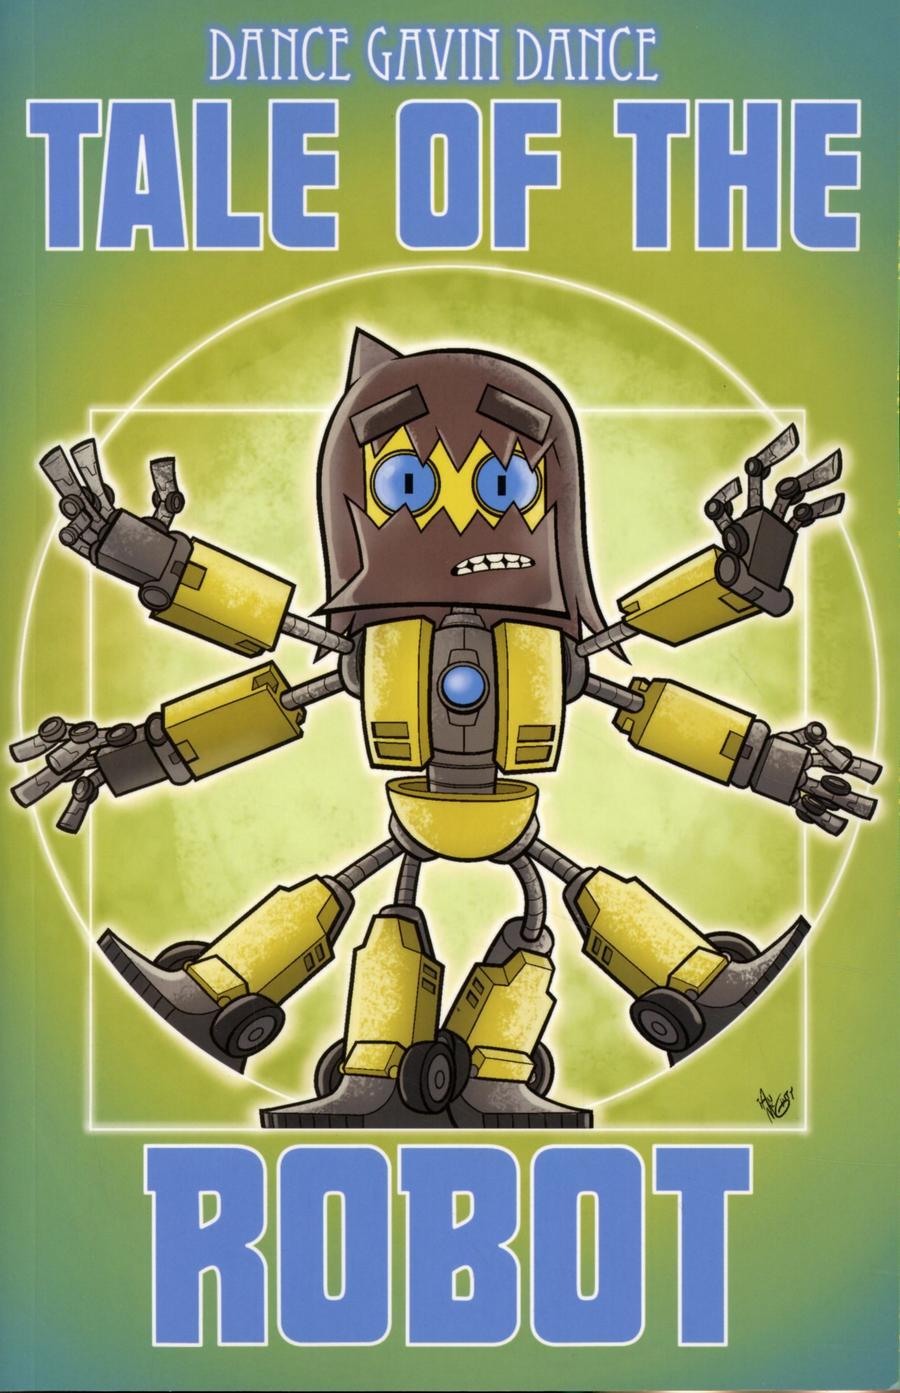 Tale Of The Robot A Dance Gavin Dance Graphic Novel TP